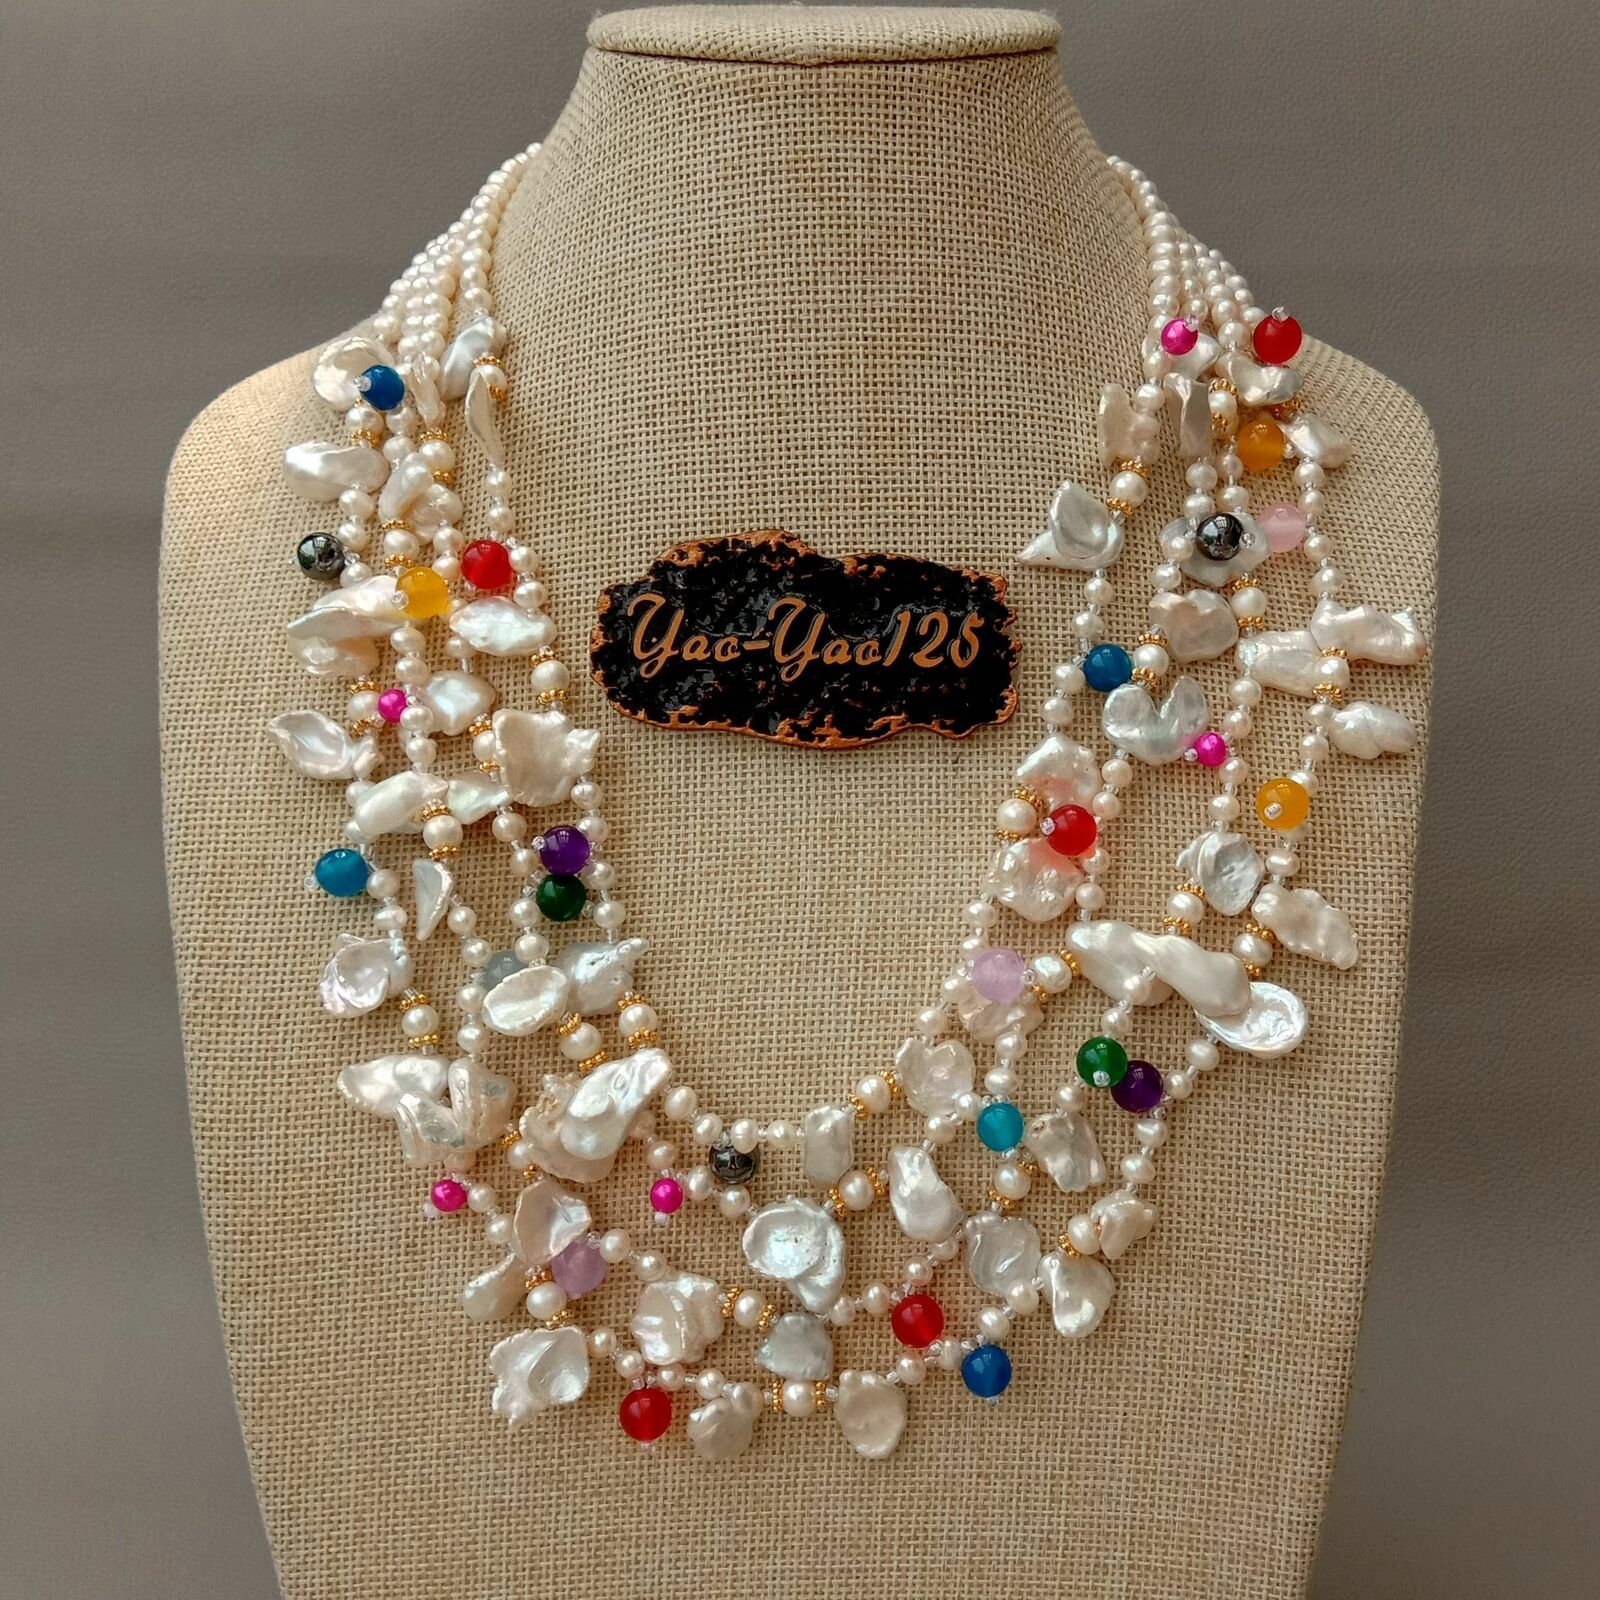 21 4 Strands Cultured White Keshi Pearl Multi Color Necklace21 4 Strands Cultured White Keshi Pearl Multi Color Necklace